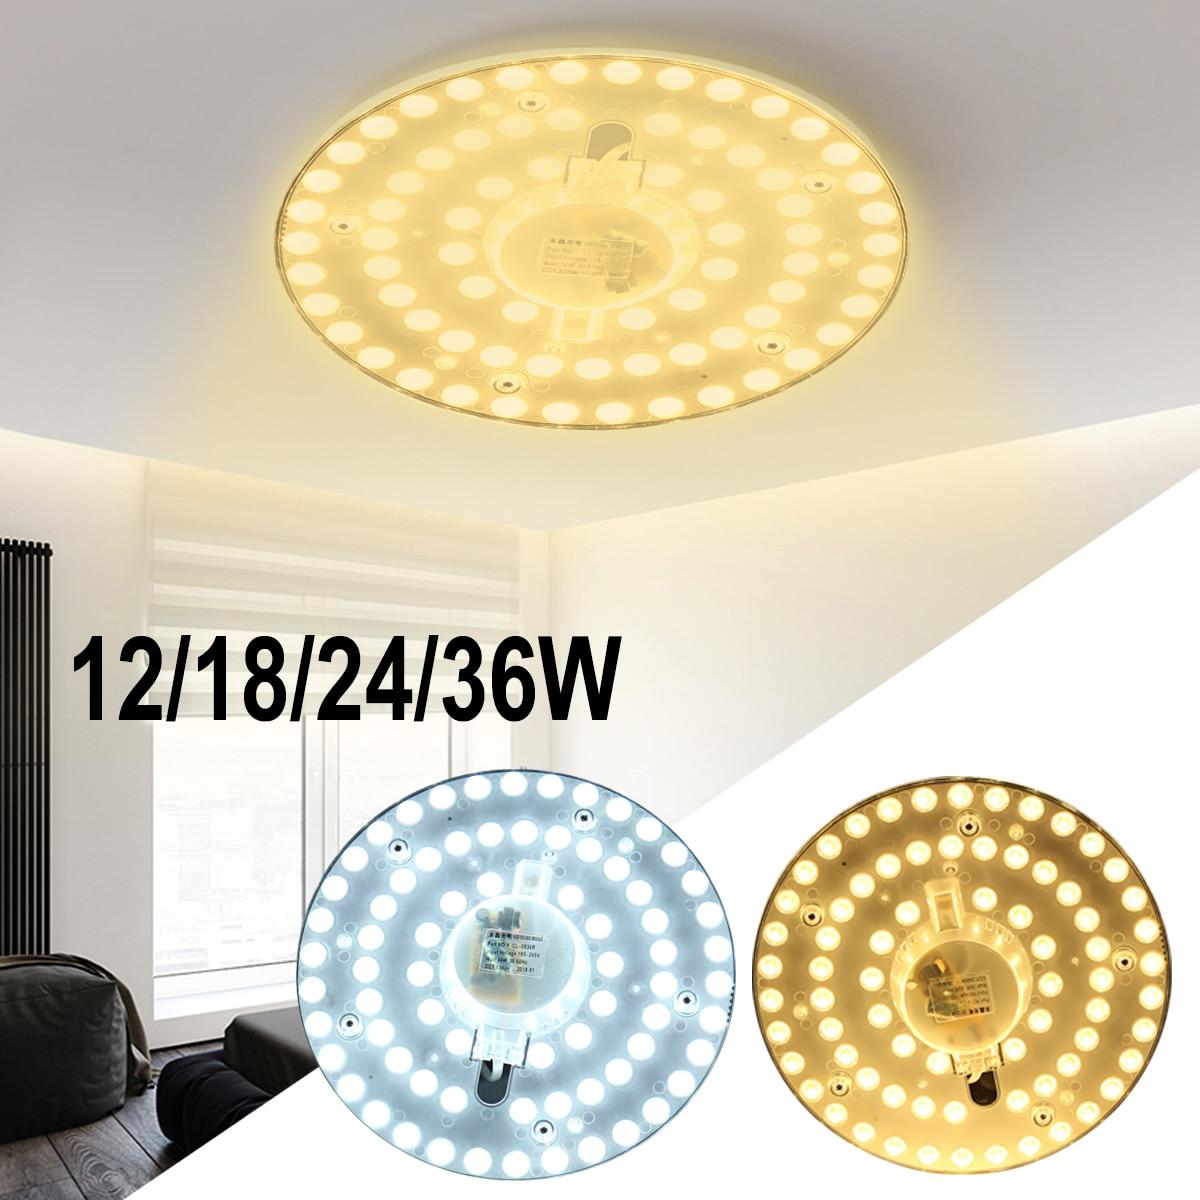 12/18/24/36W Round Ceiling Lights LED Modern Ceiling Lamp Fixture Lighting Decoration for Living Room Bedroom Kitchen